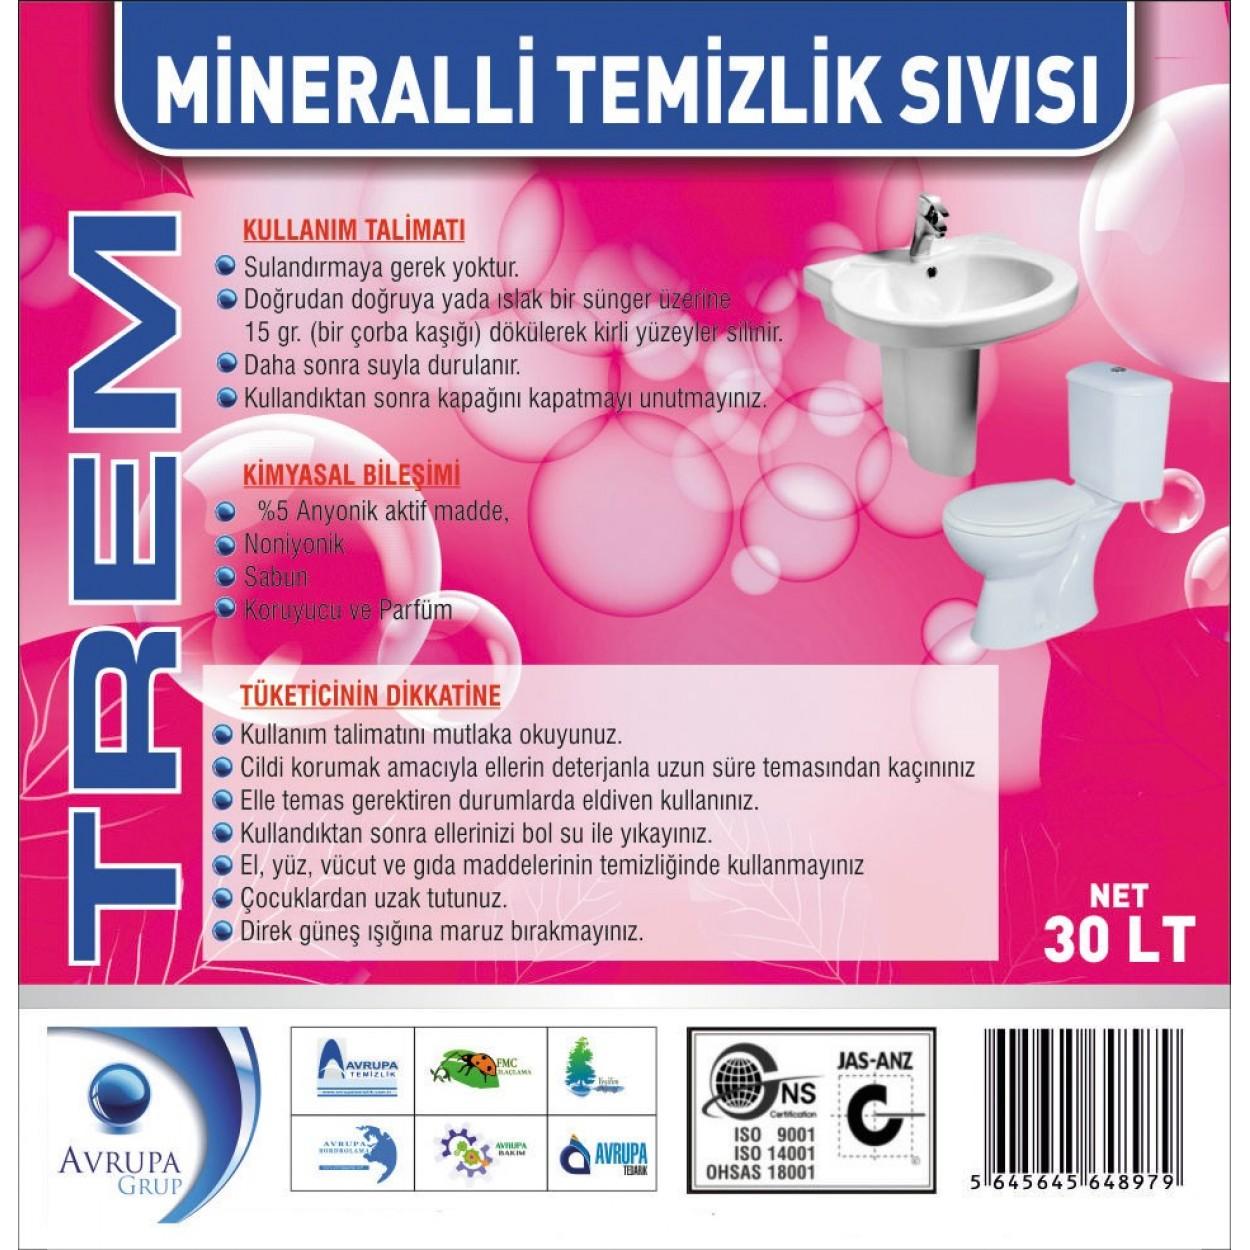 TREM Mineralli Temizlik Sıvısı 10 Litre